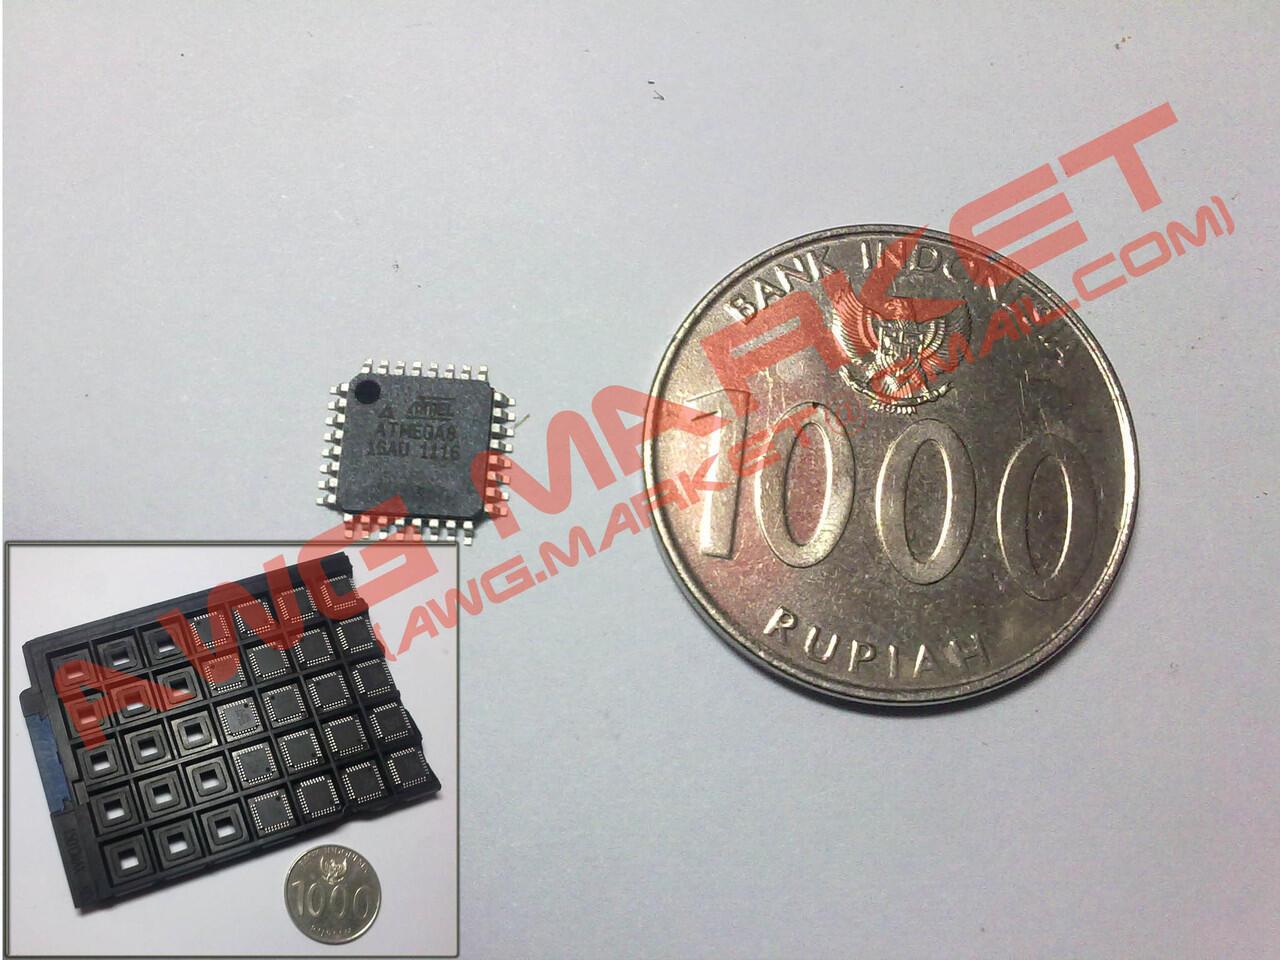 [WTS] mikrokontroler ATMEL (atmega, attiny)